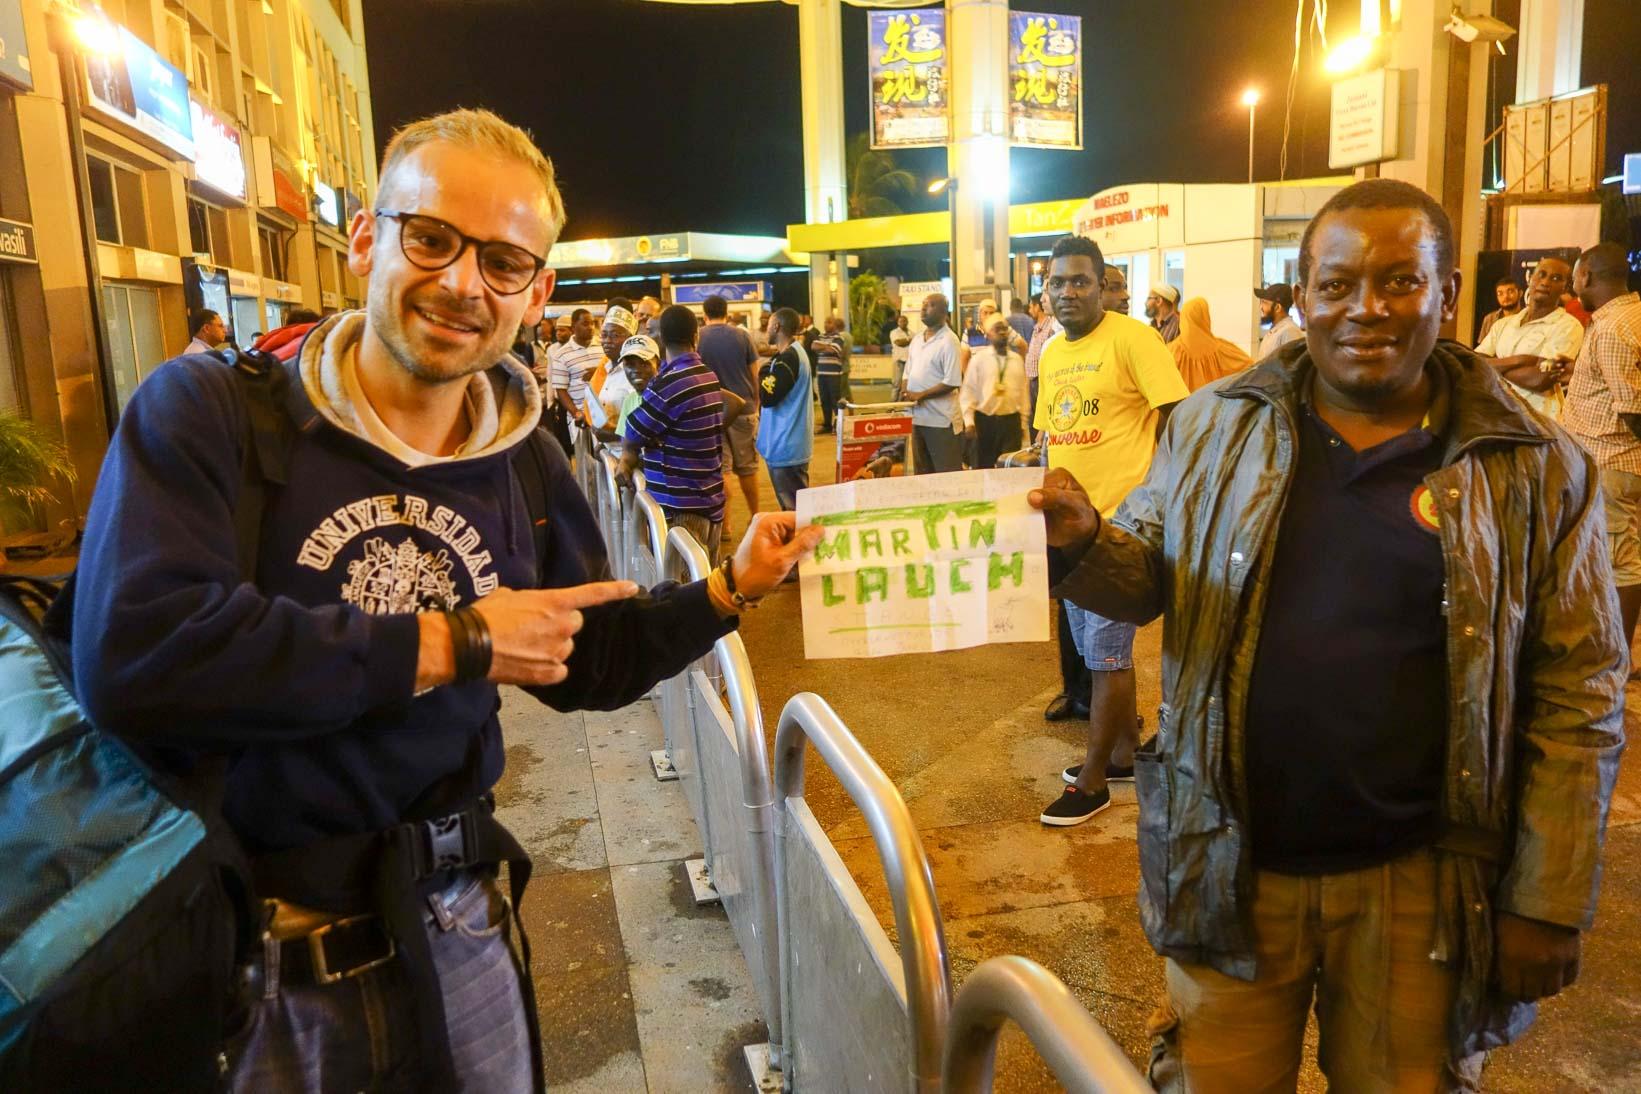 Suche Martin Lauch for Suppe(R)! | Airport Dar es Salaam - Tansania